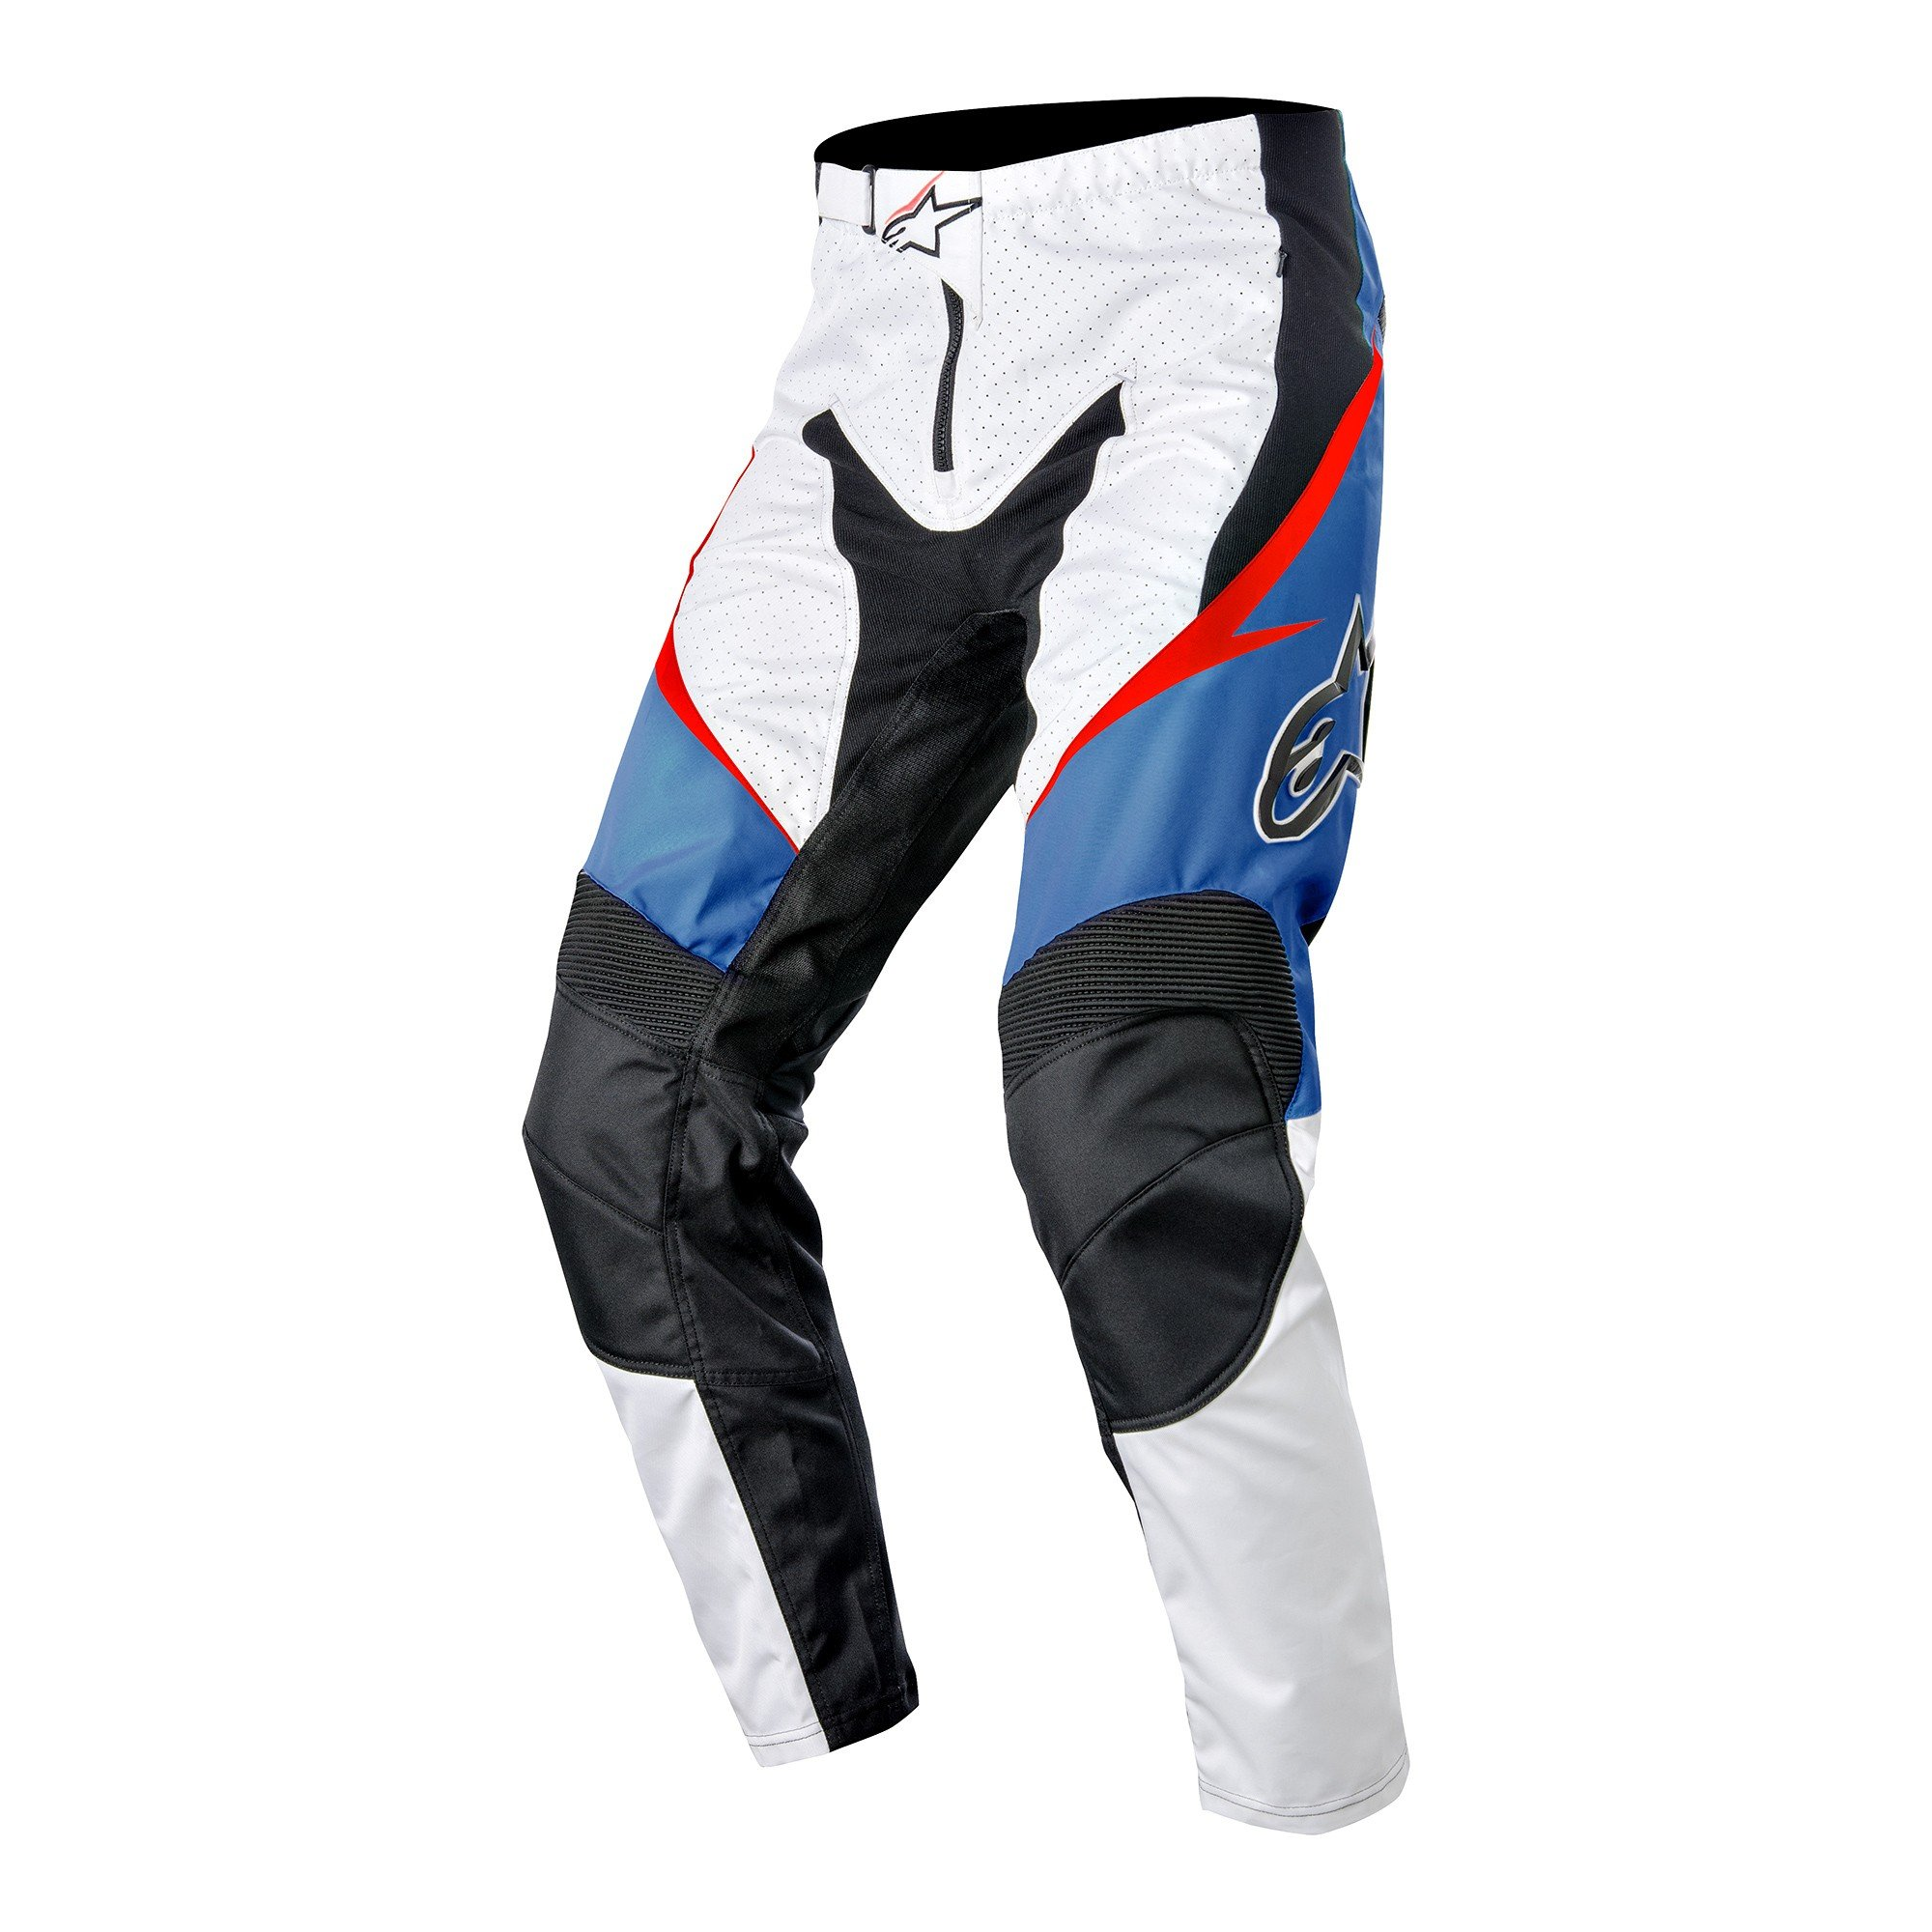 Alpinestars Men's Sight Pant, 32, White/Red/Electric Blue by Alpinestars (Image #1)